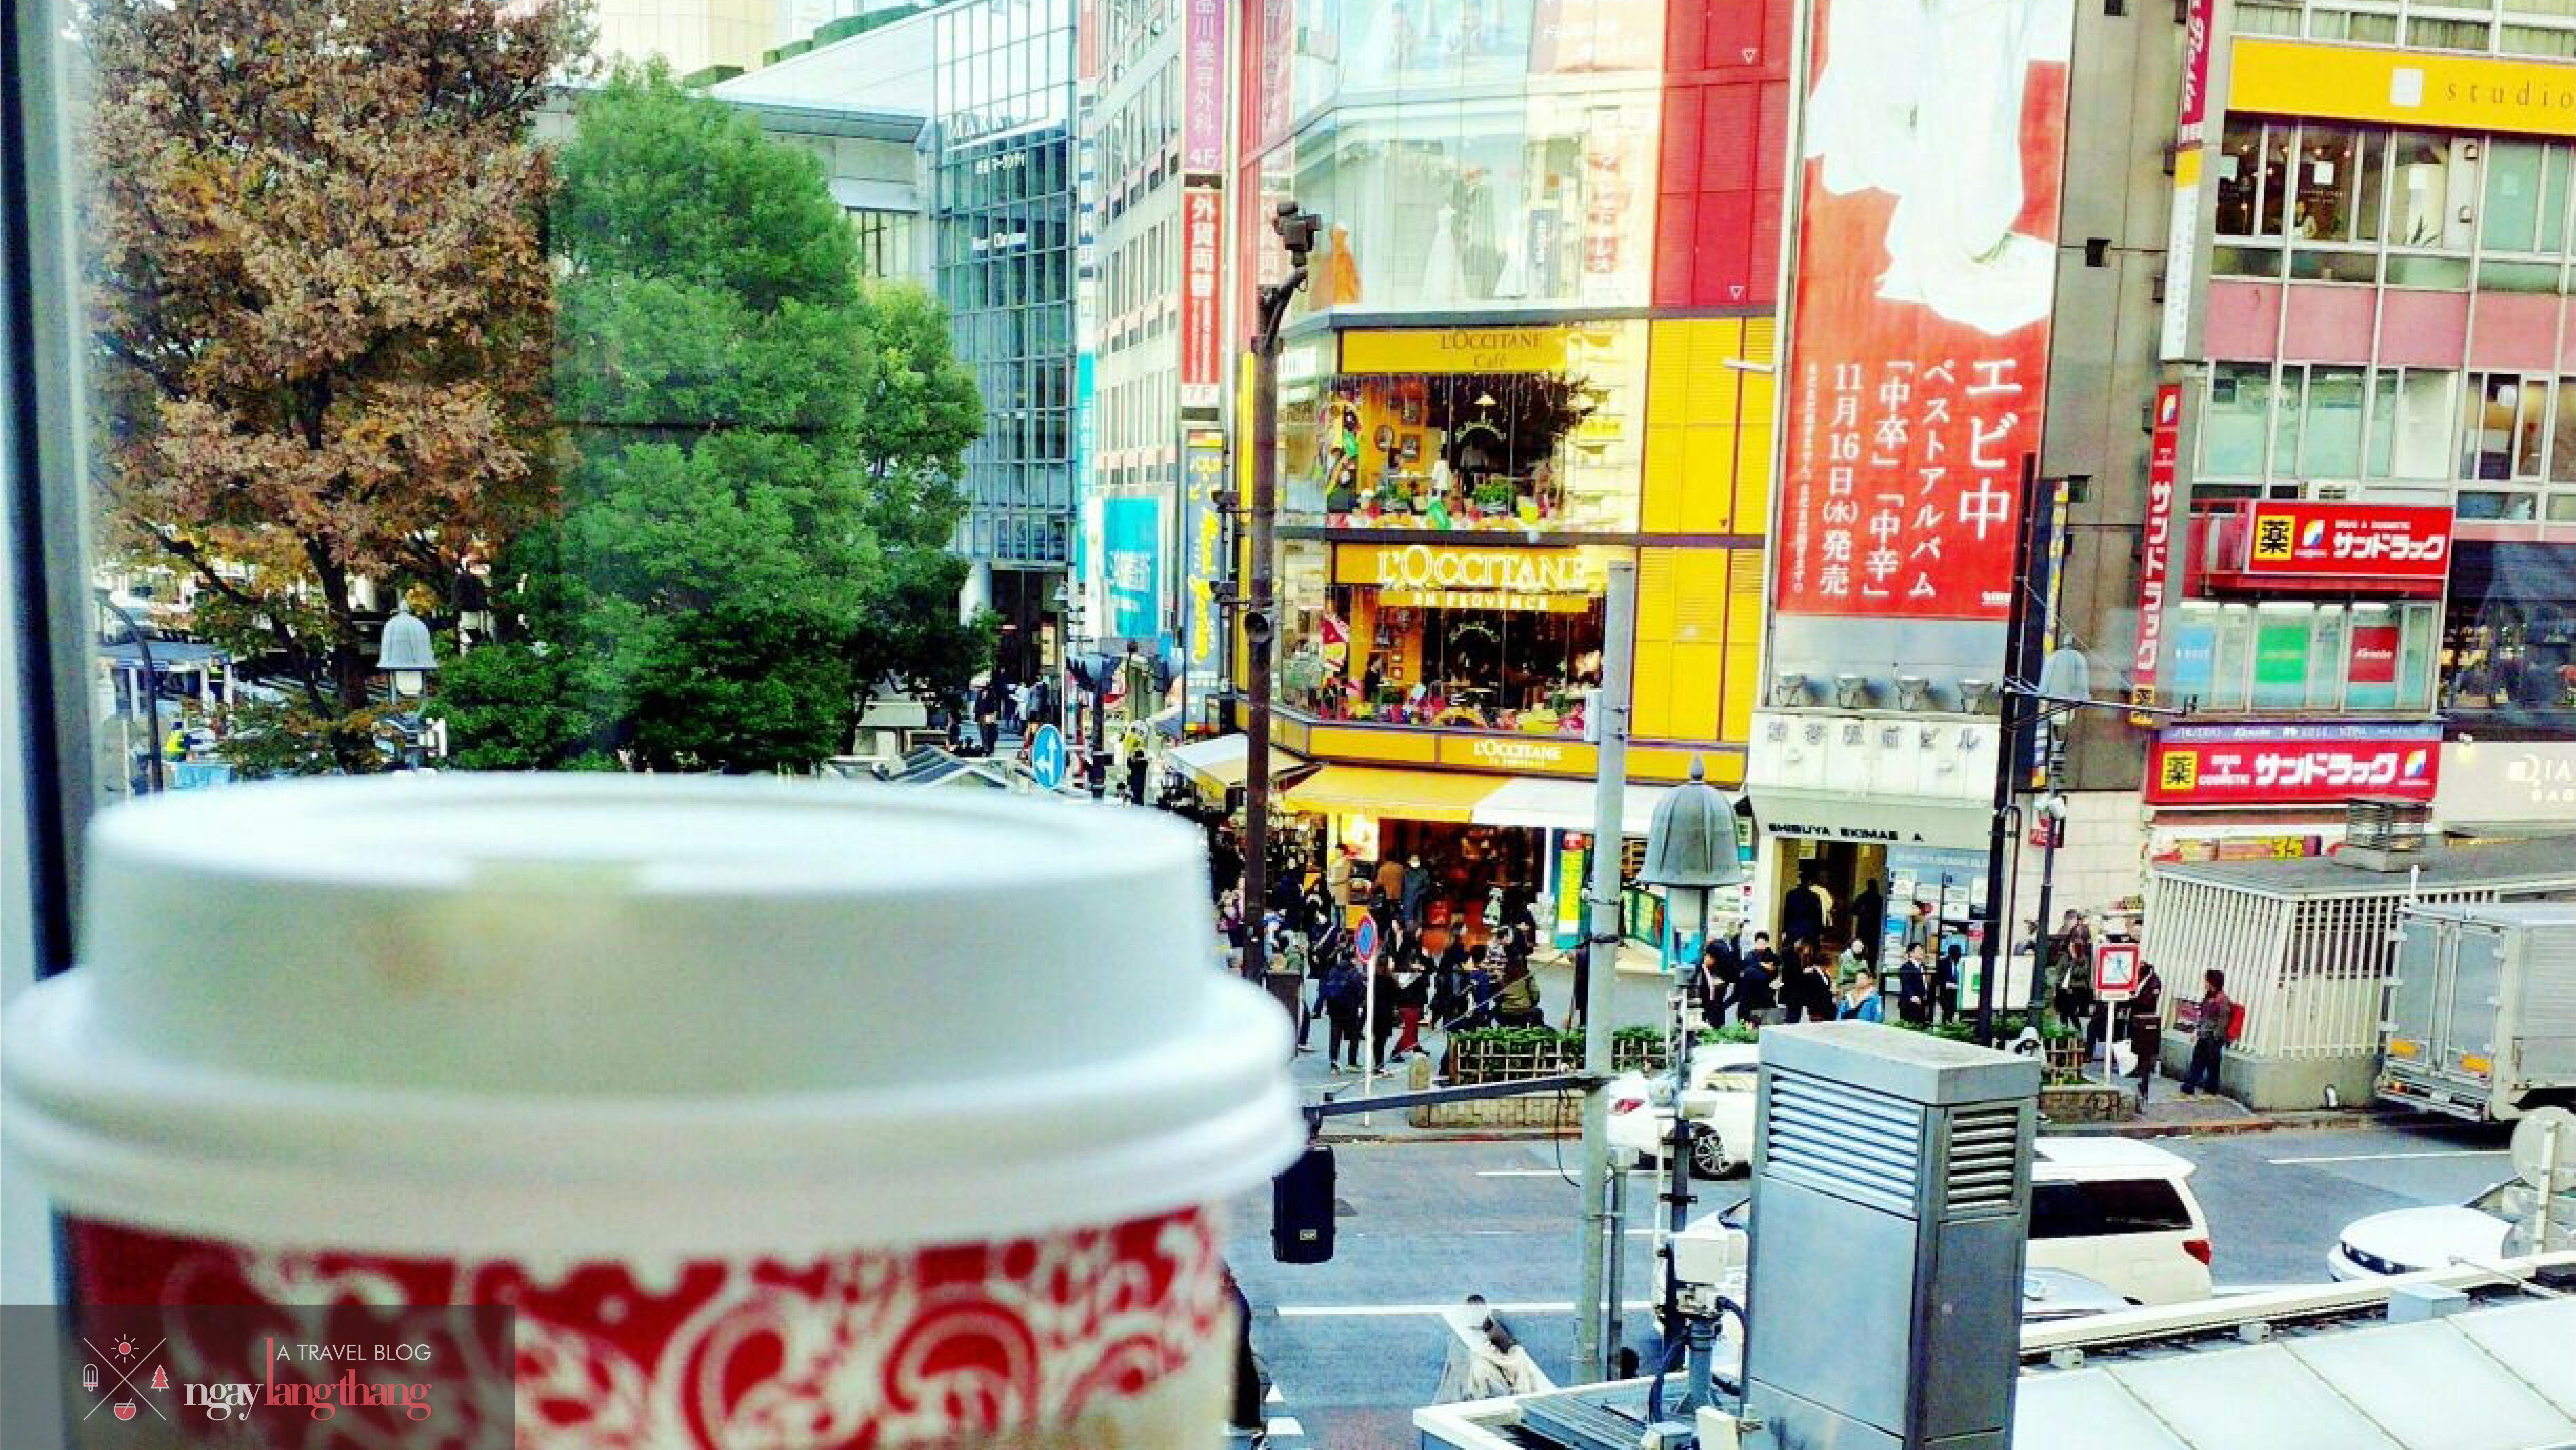 Starbucks Shibuya Tsutaya